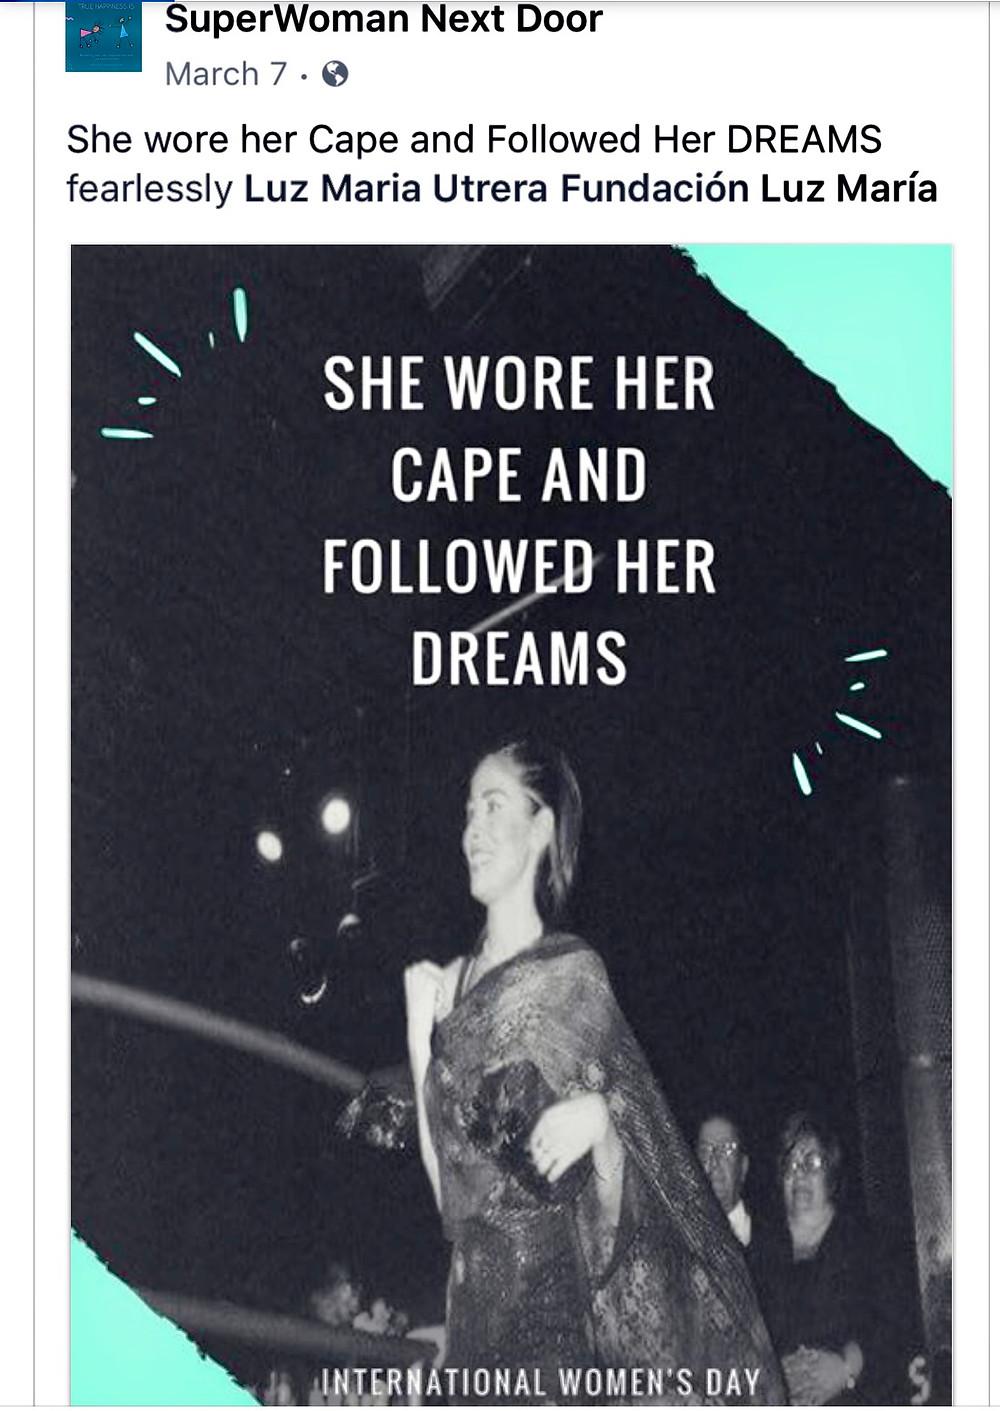 The Founder Luz Maria is a SuperWoman Next Door EN